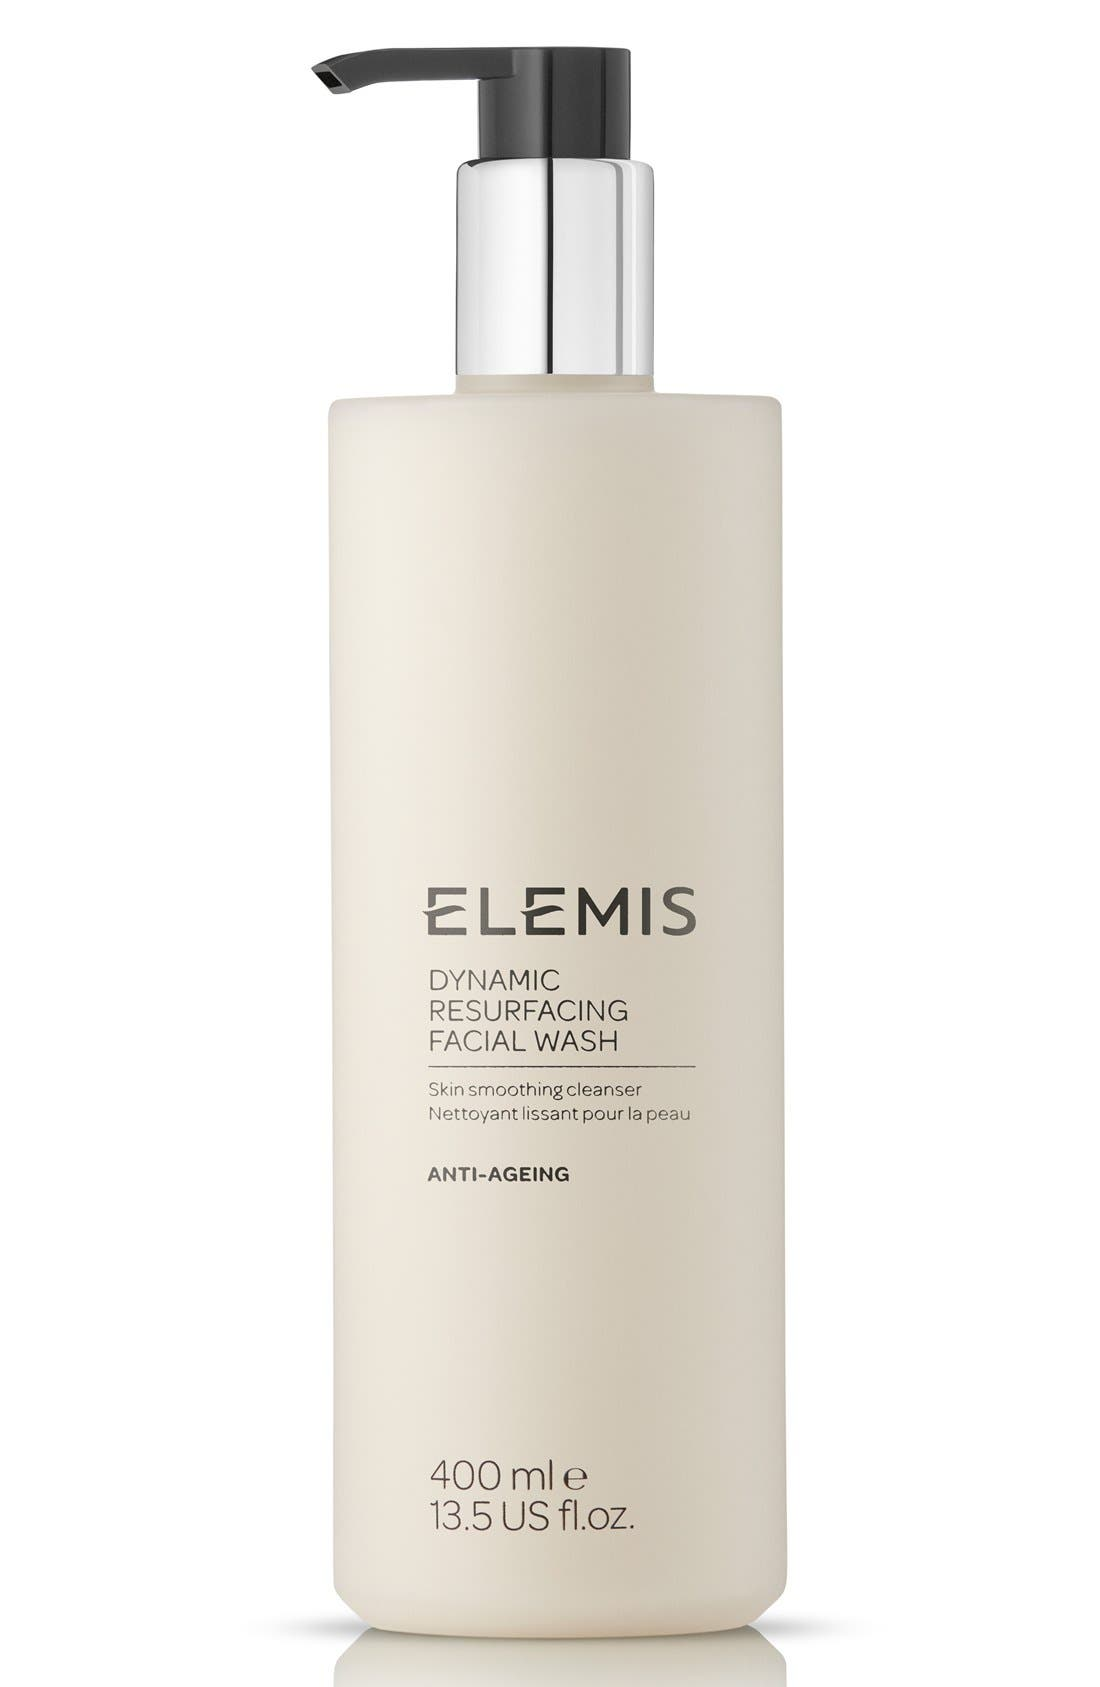 Elemis Dynamic Resurfacing Facial Wash (Nordstrom Exclusive) ($100 Value)